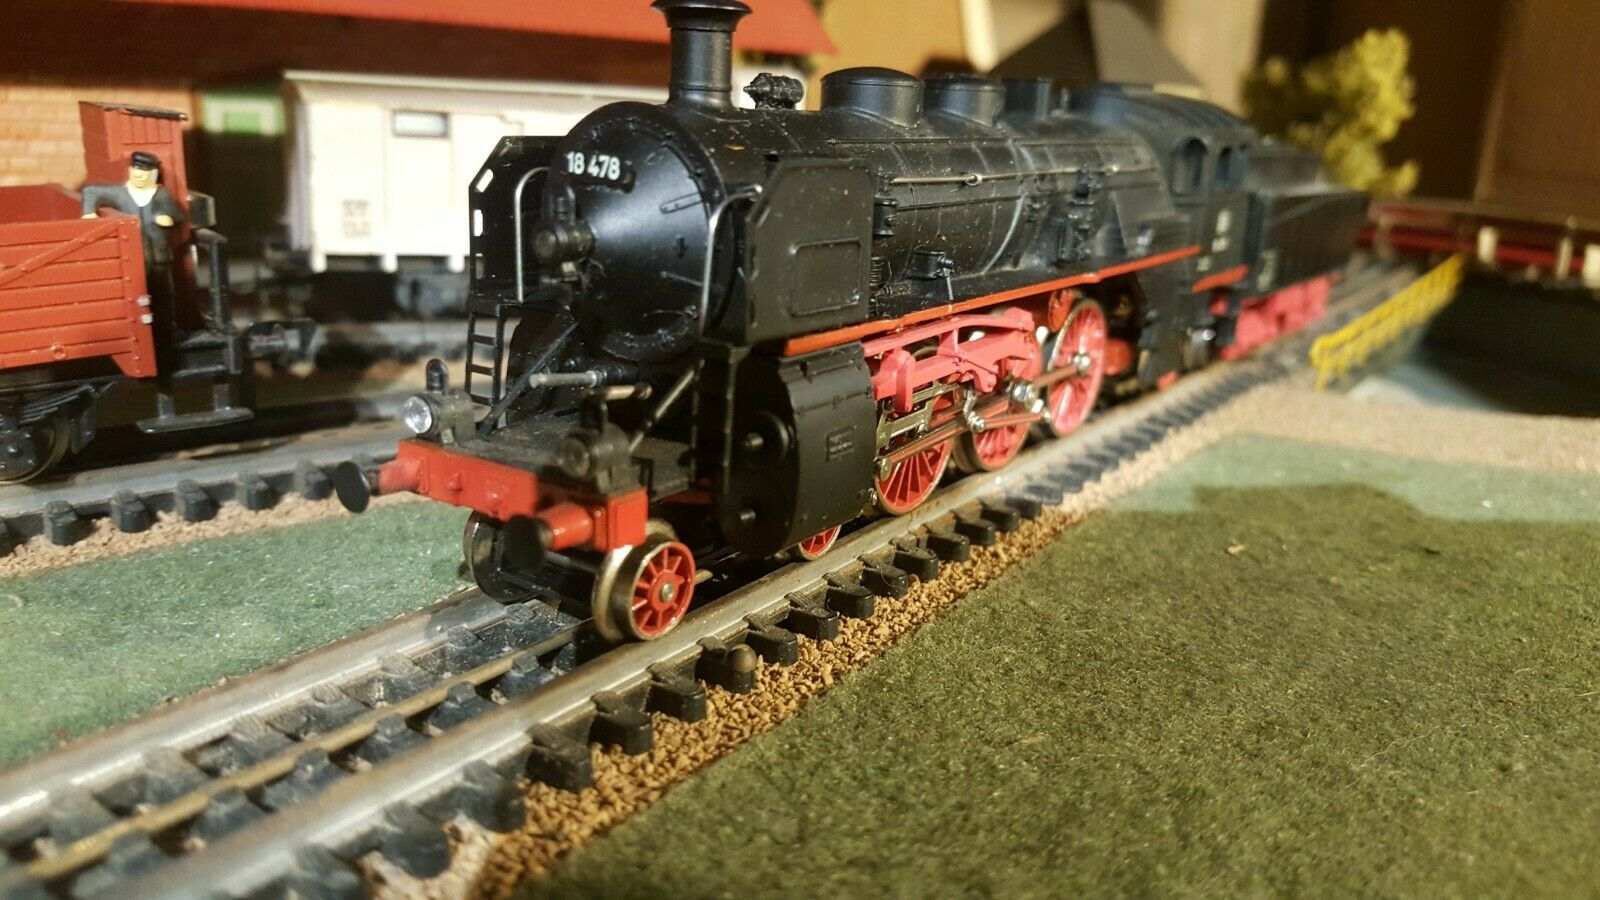 Marklin Hamo échelle ho locomotive 231 réf   8391